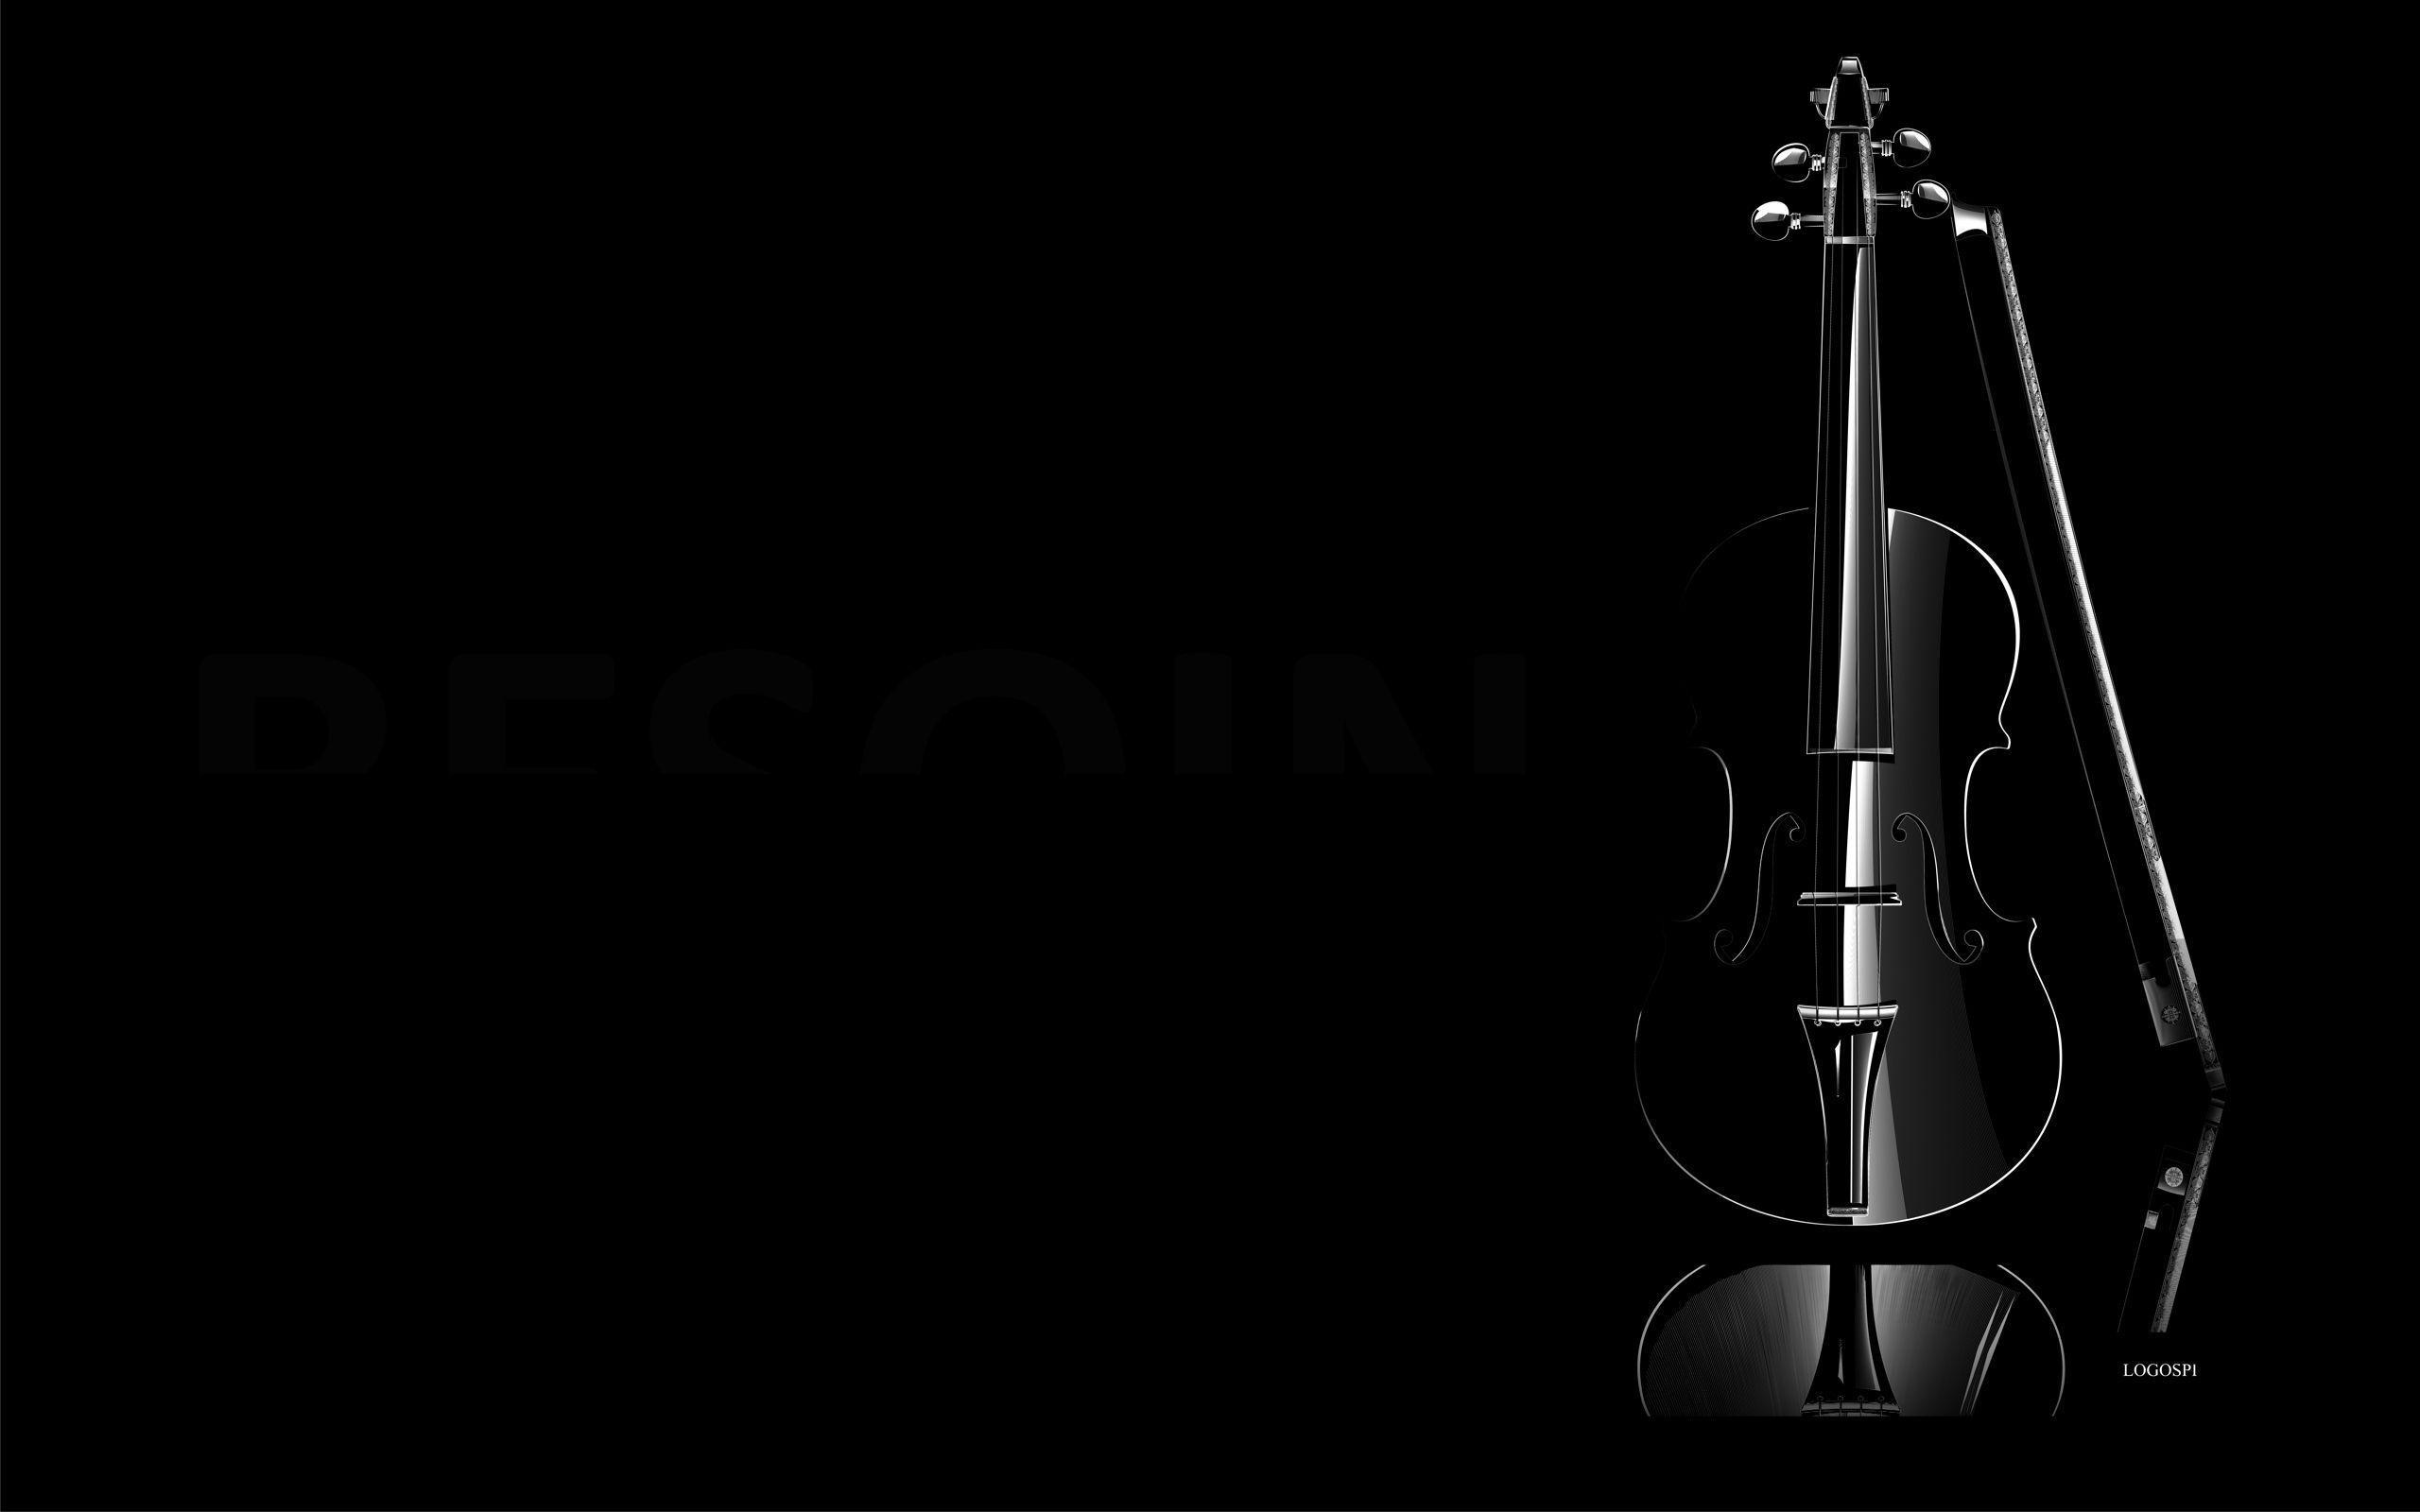 2560x1600 Black Art Wallpapers Violin Music Creative